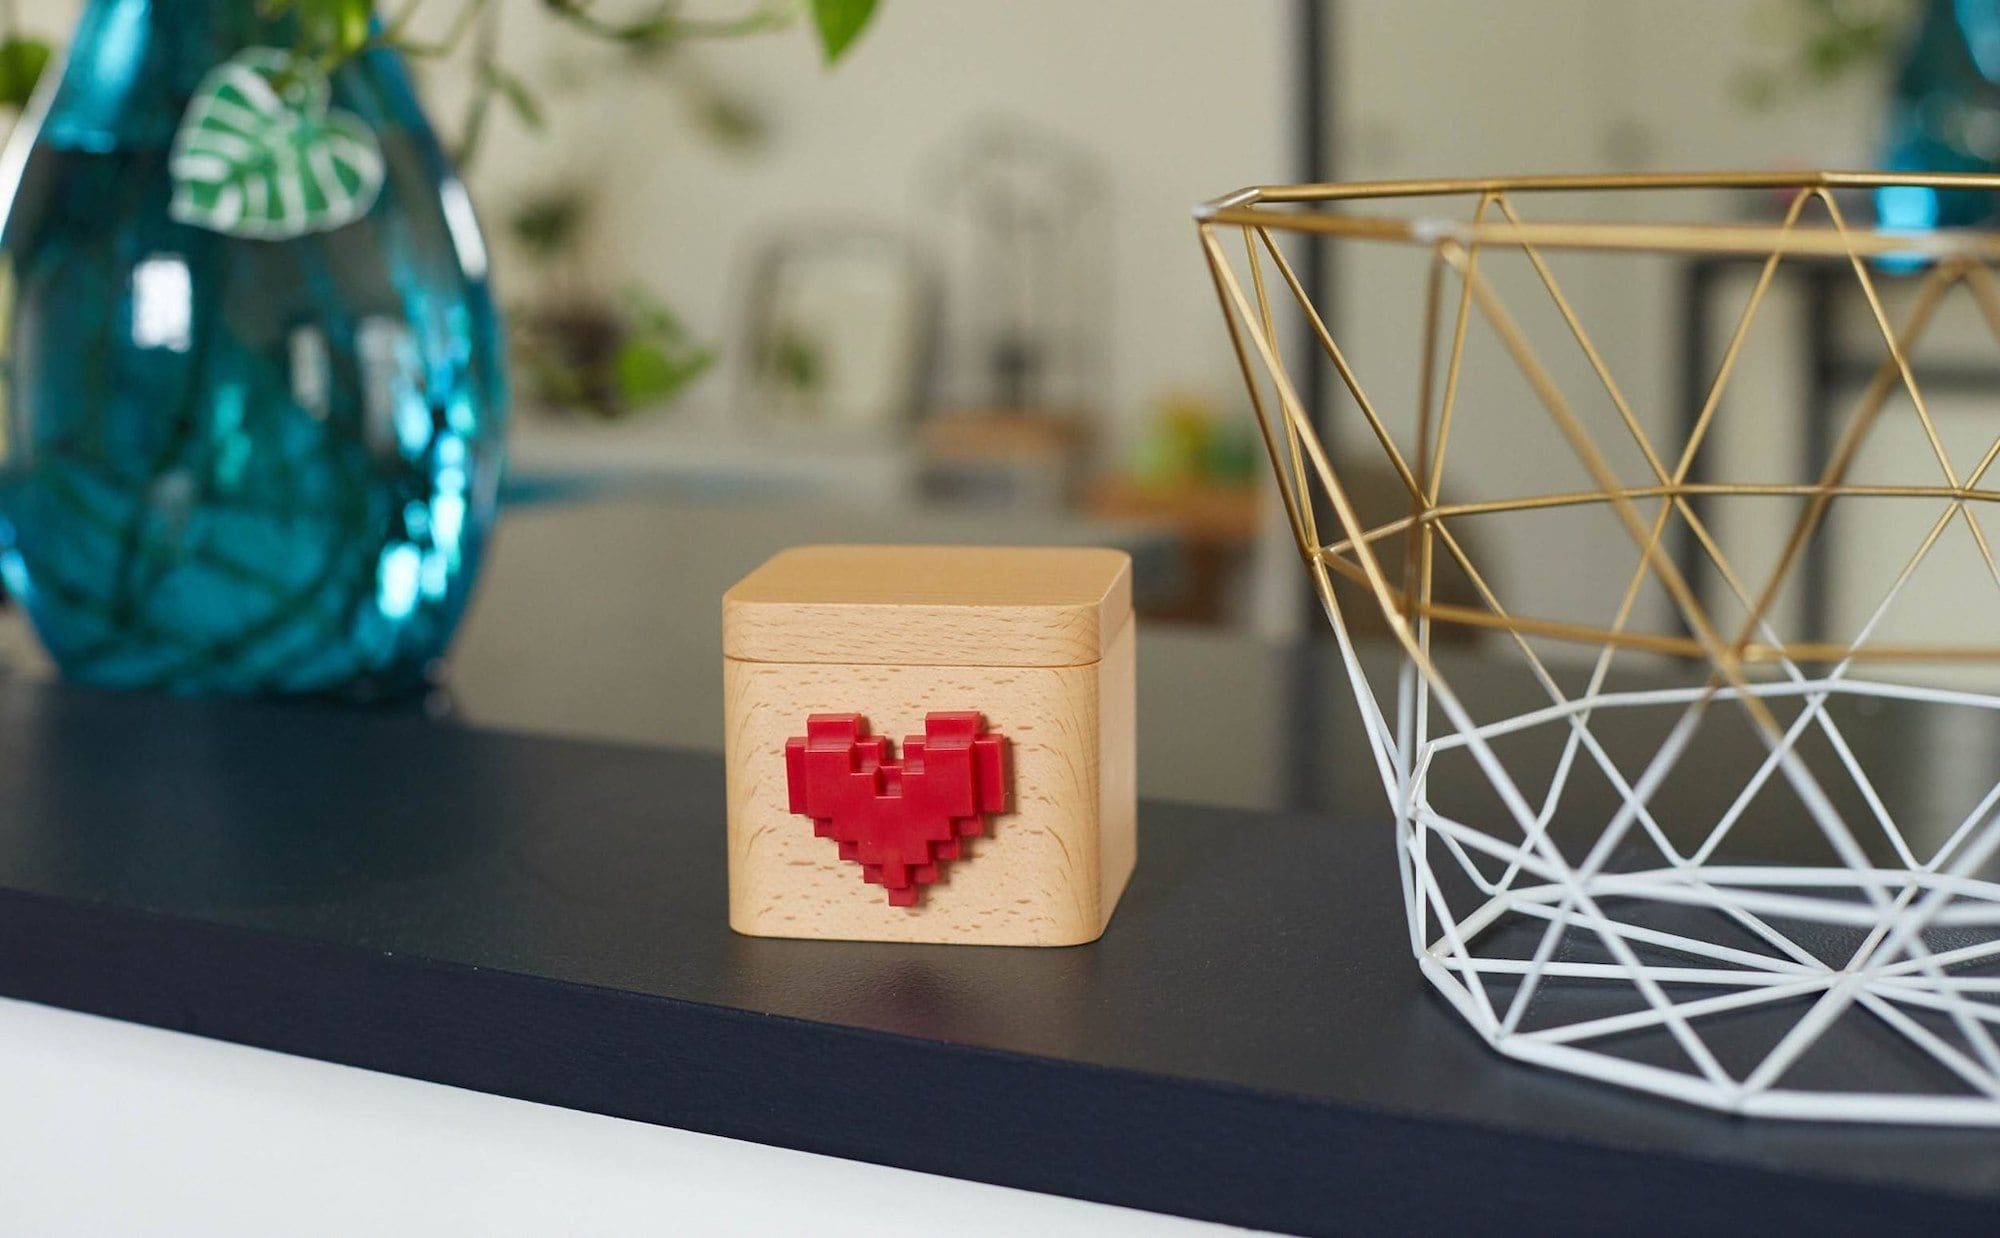 Lovebox Modern Love Note Messenger displays personalized